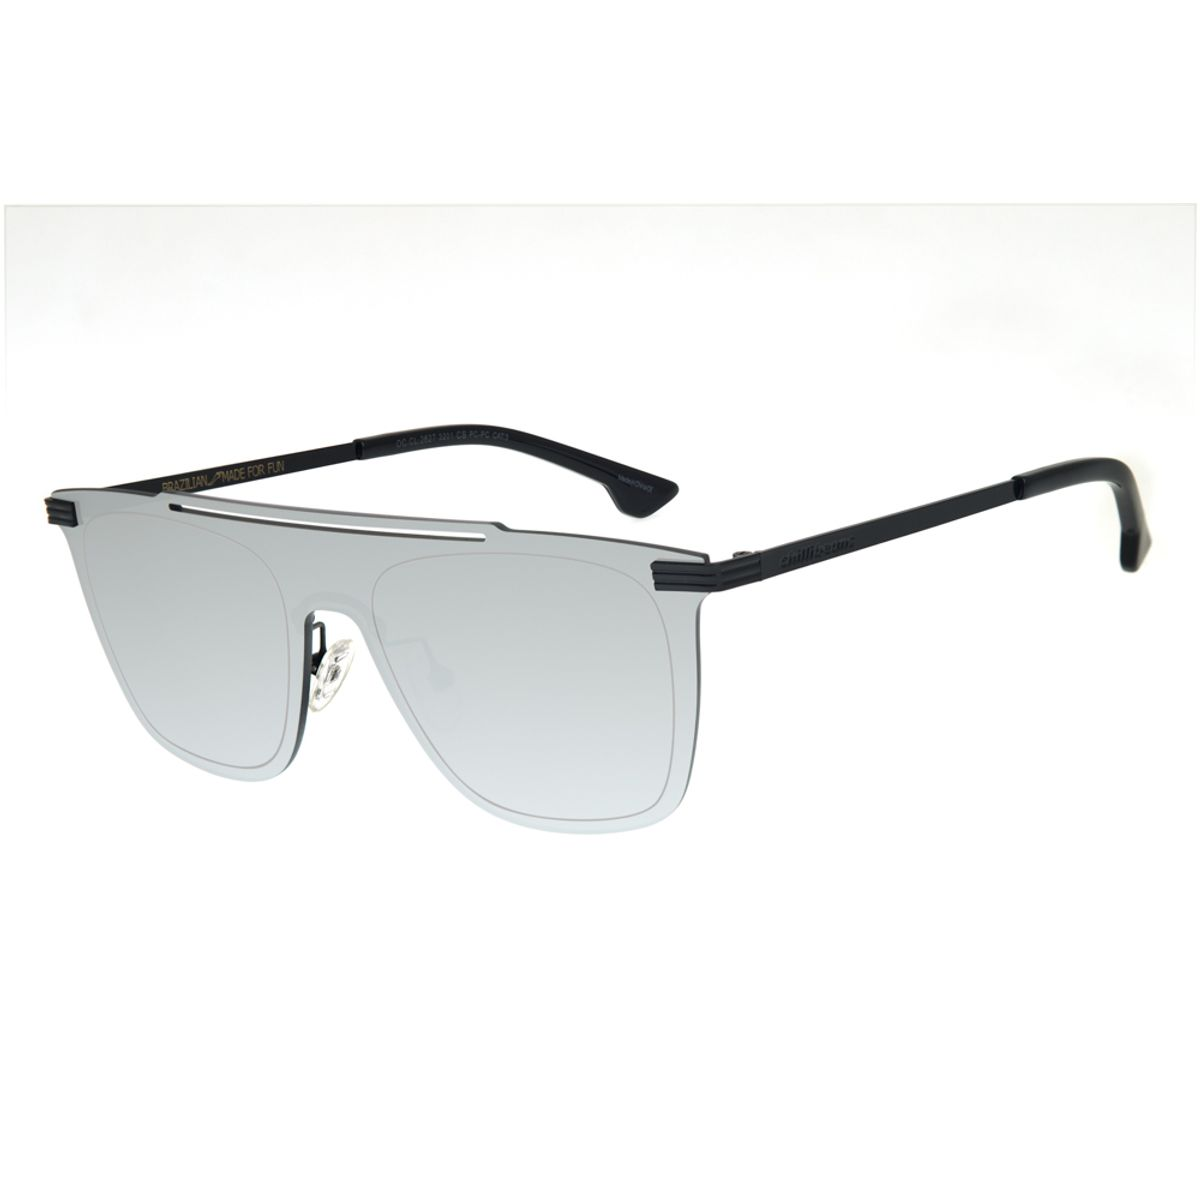 31bb02a9f Óculos de Sol Chilli Beans Masculino Máscara Espelhado 3201 - Chilli ...